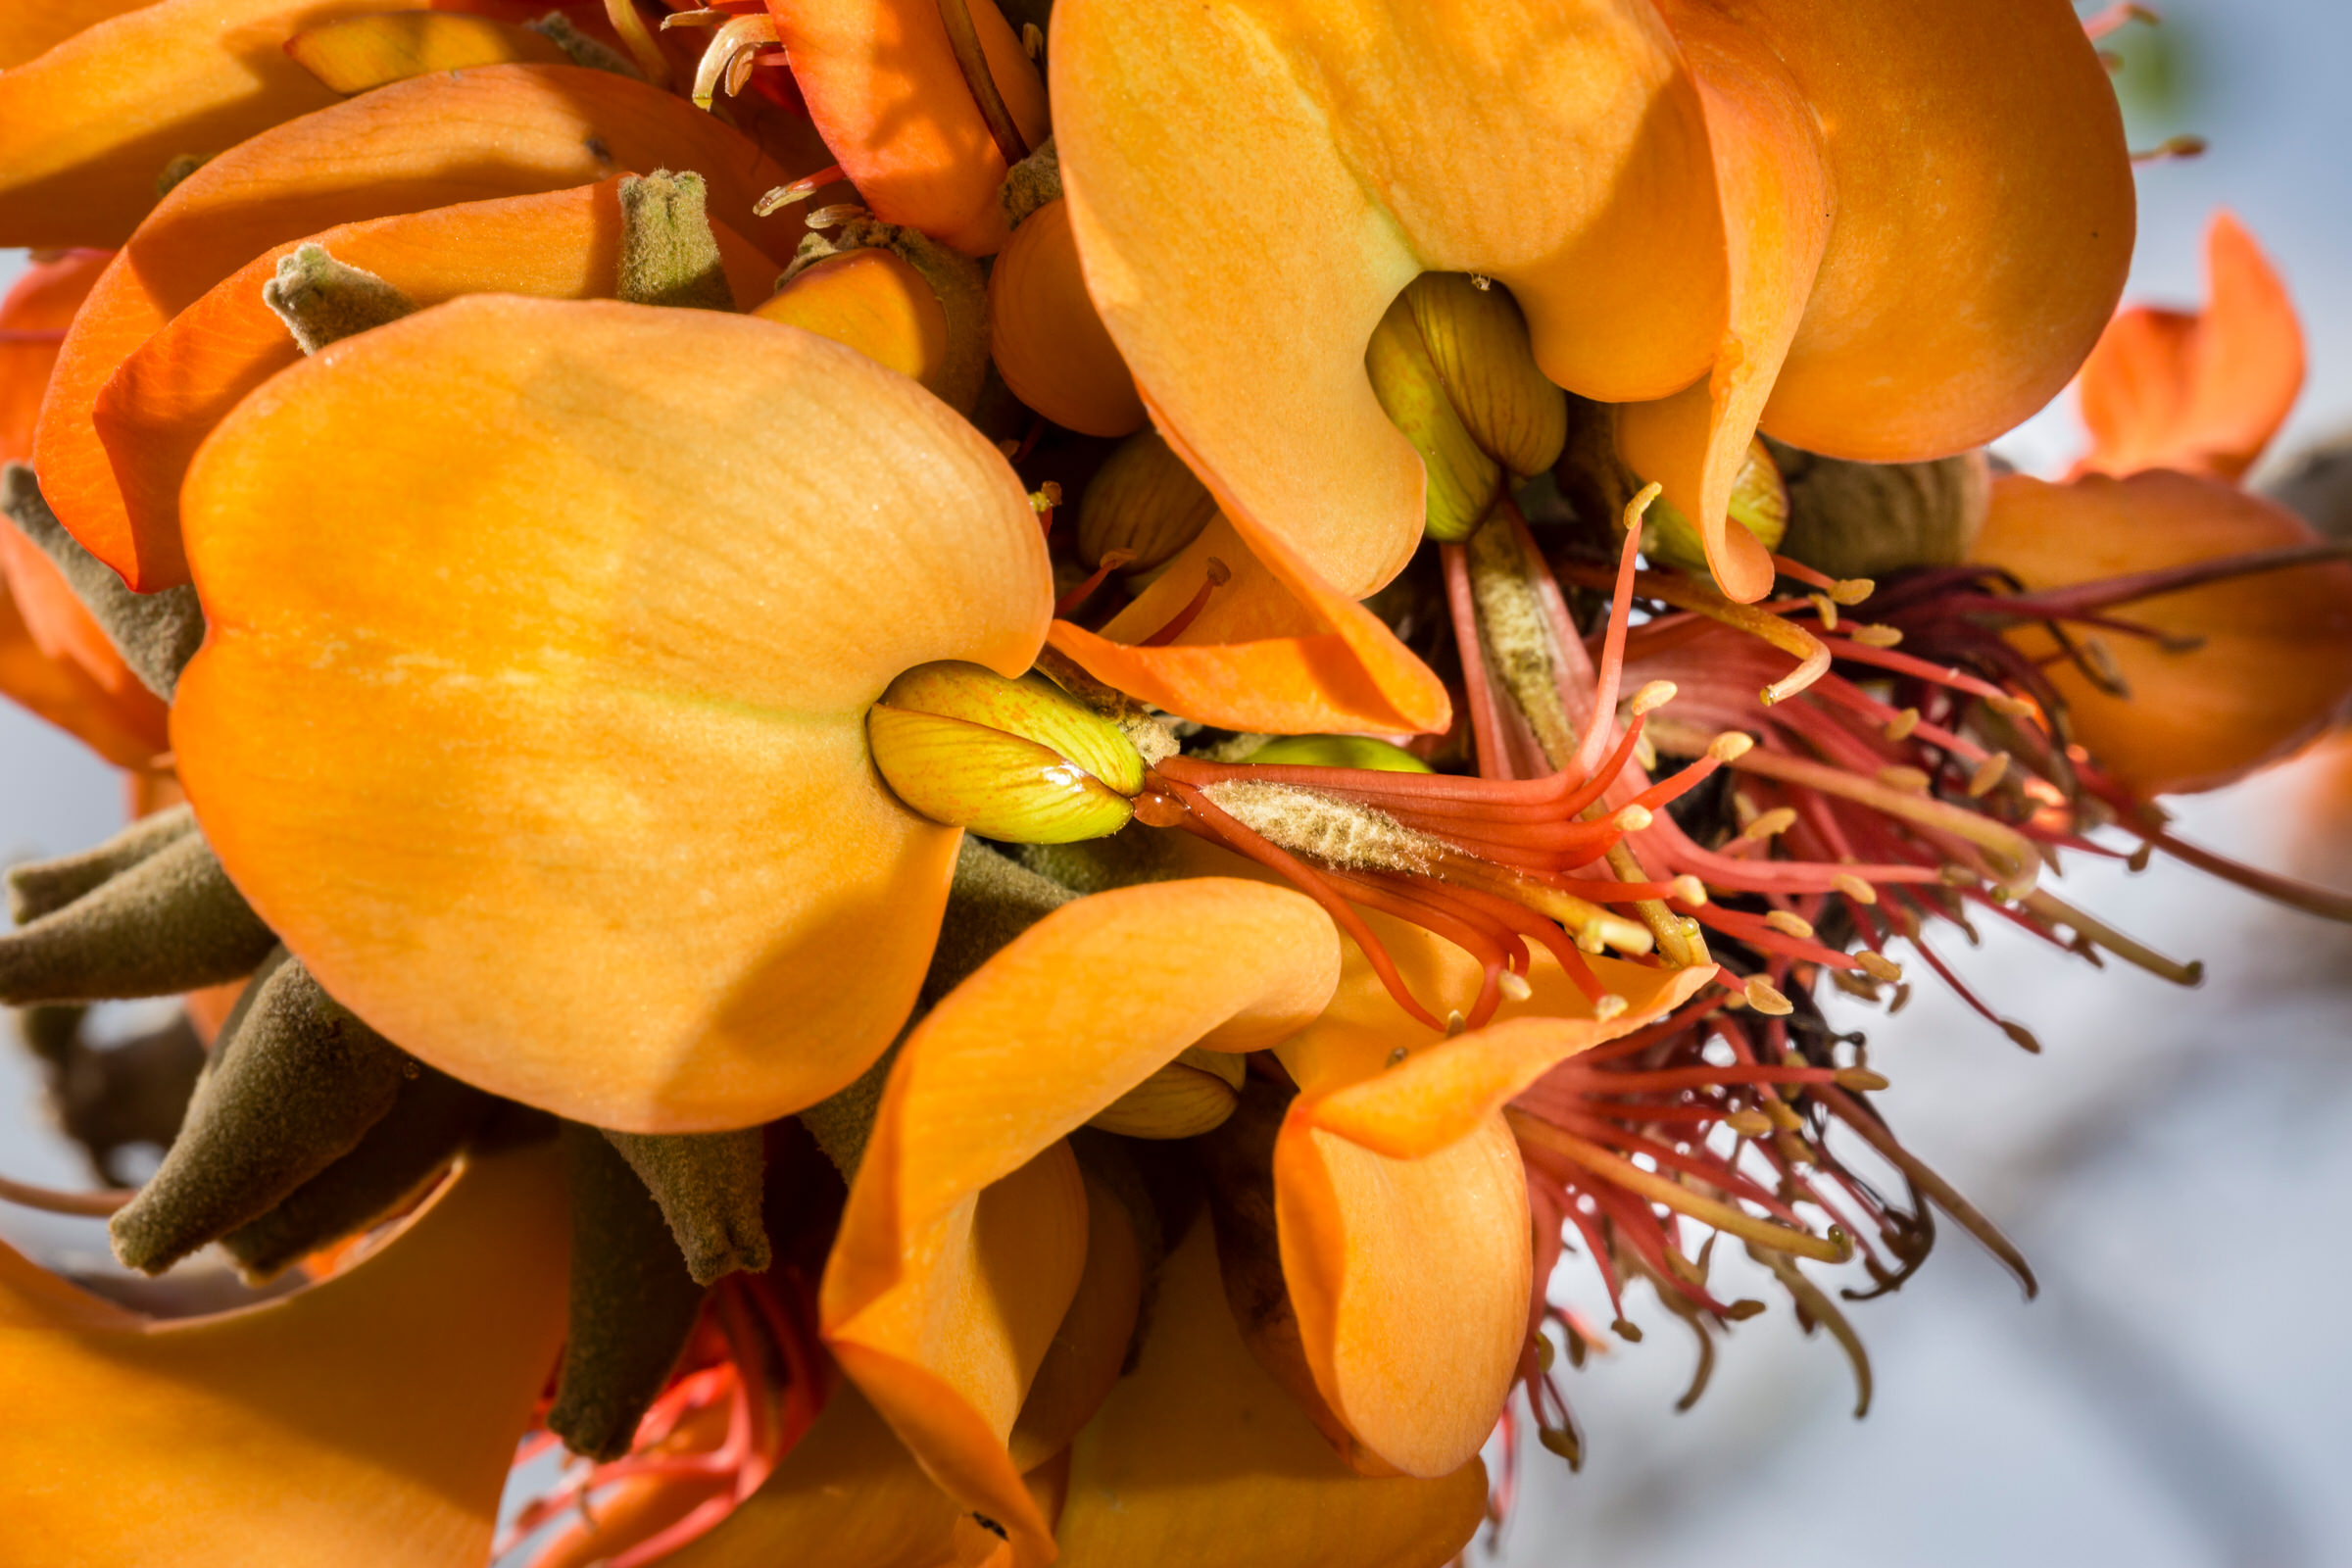 dry-forest-preserve-flowering-willi-willi-tree-festival-Waikoloa-Village-Hawaii-Island-South-Kohala-347.jpg